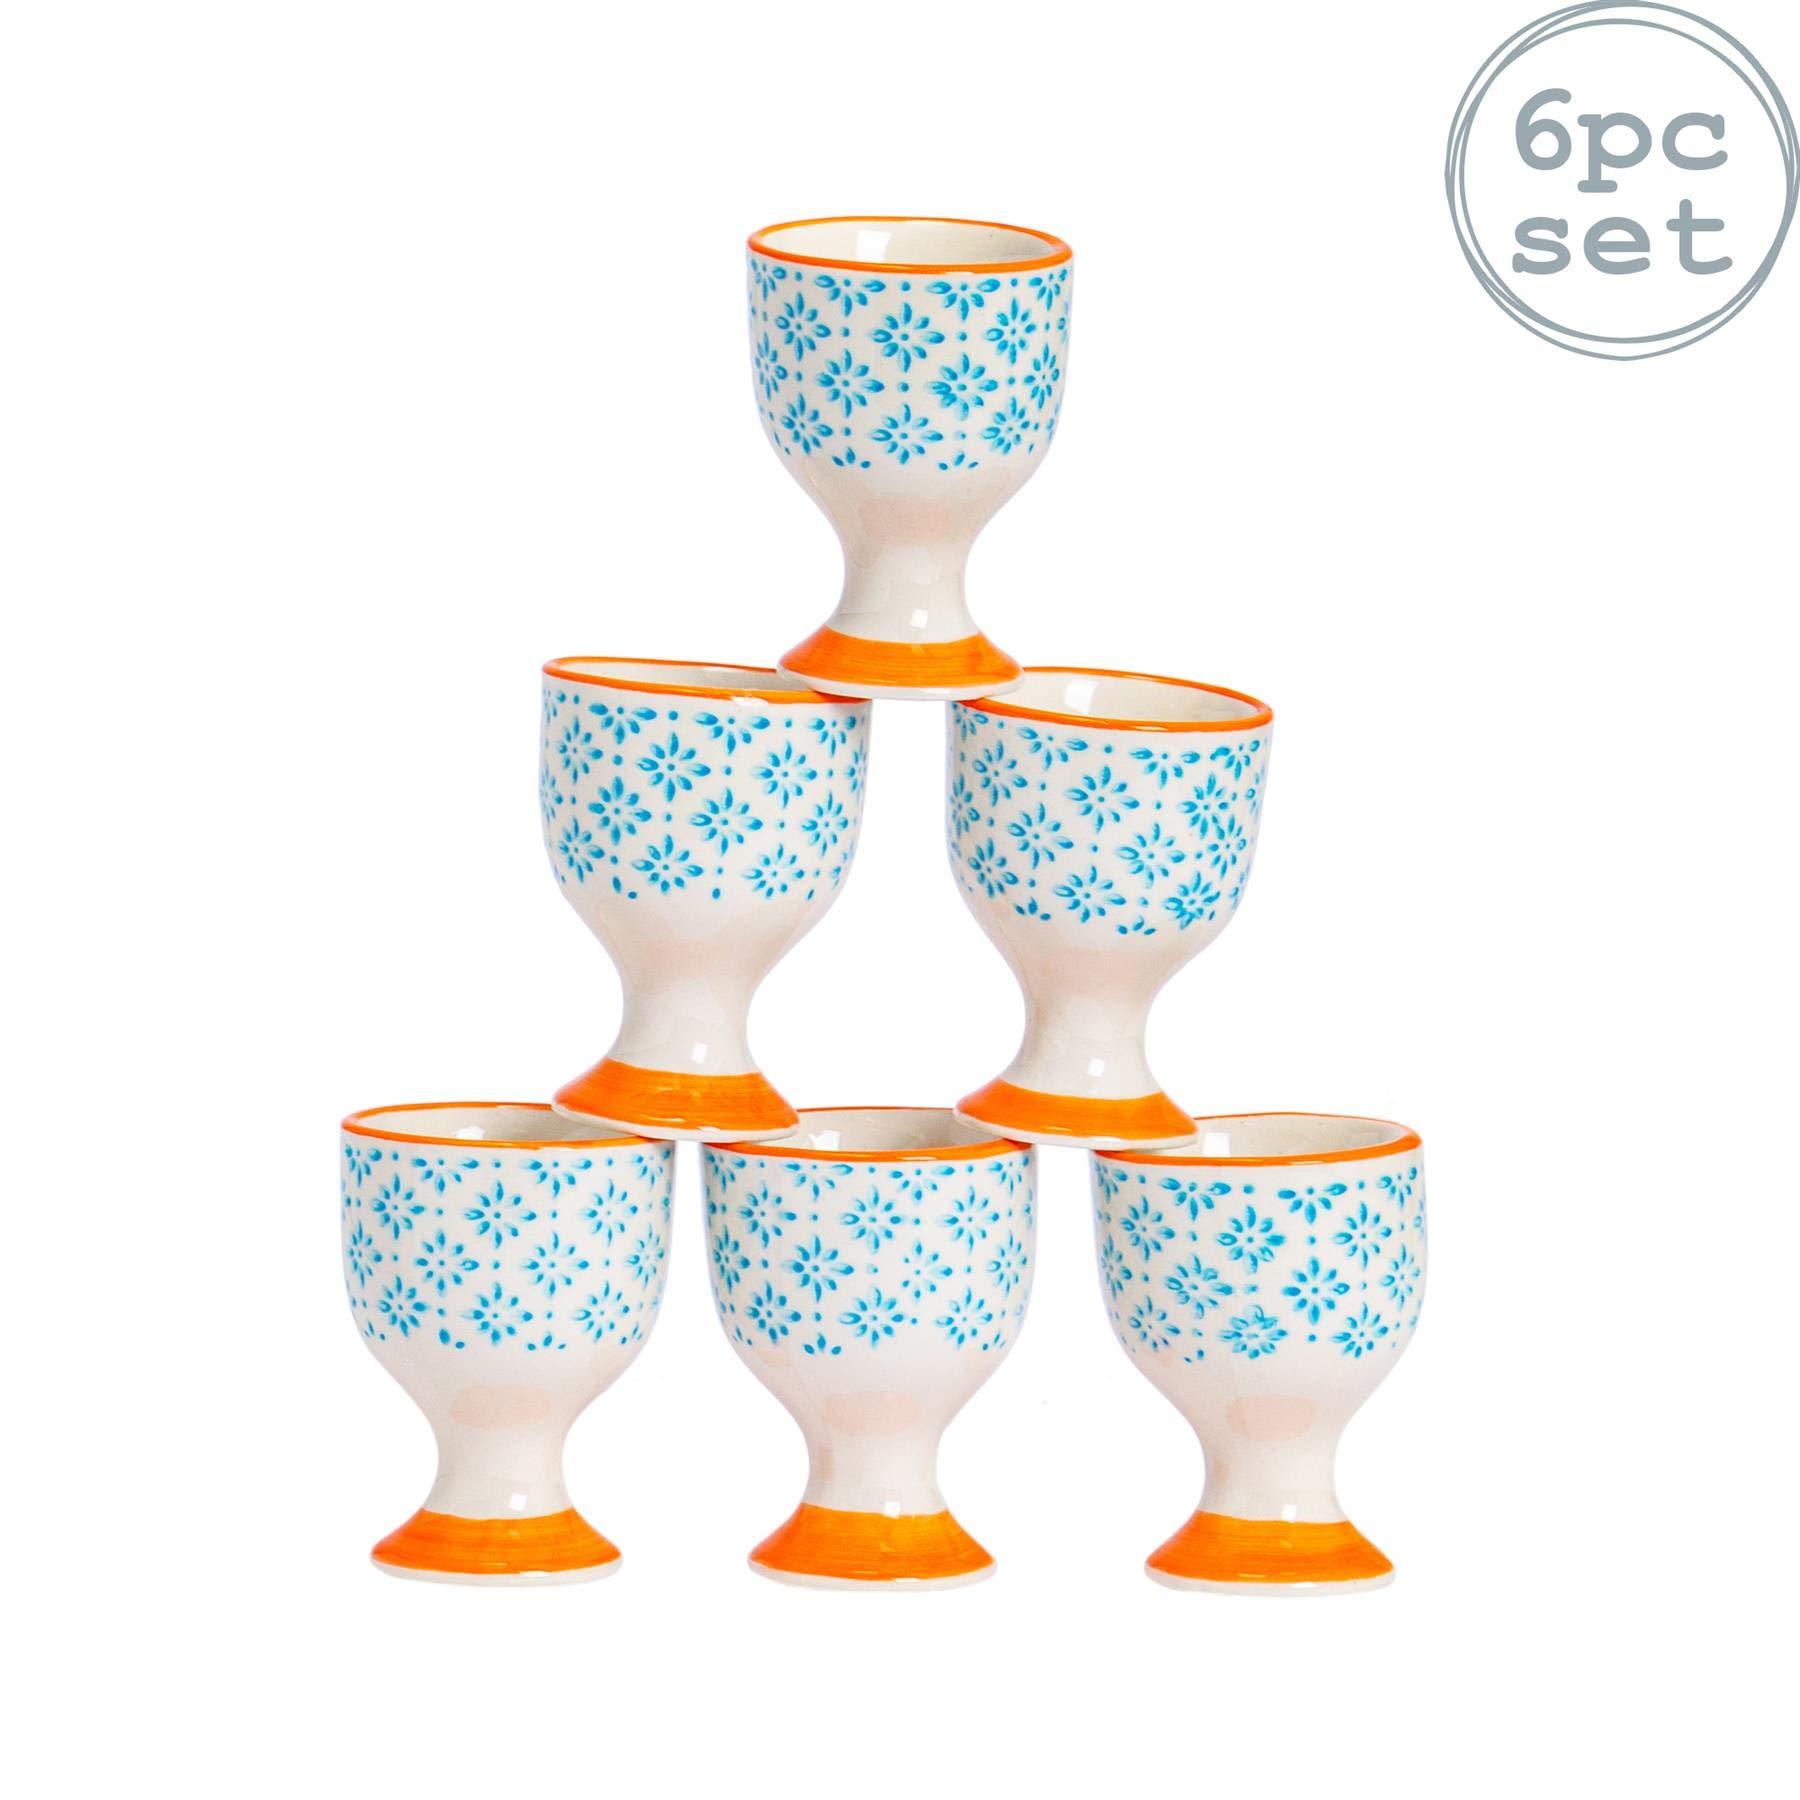 Nicola Spring 6 Piece Hand-Printed Egg Cup Set - Japanese Style Porcelain Breakfast Hard Soft Boiled Eggs Holder - Blue